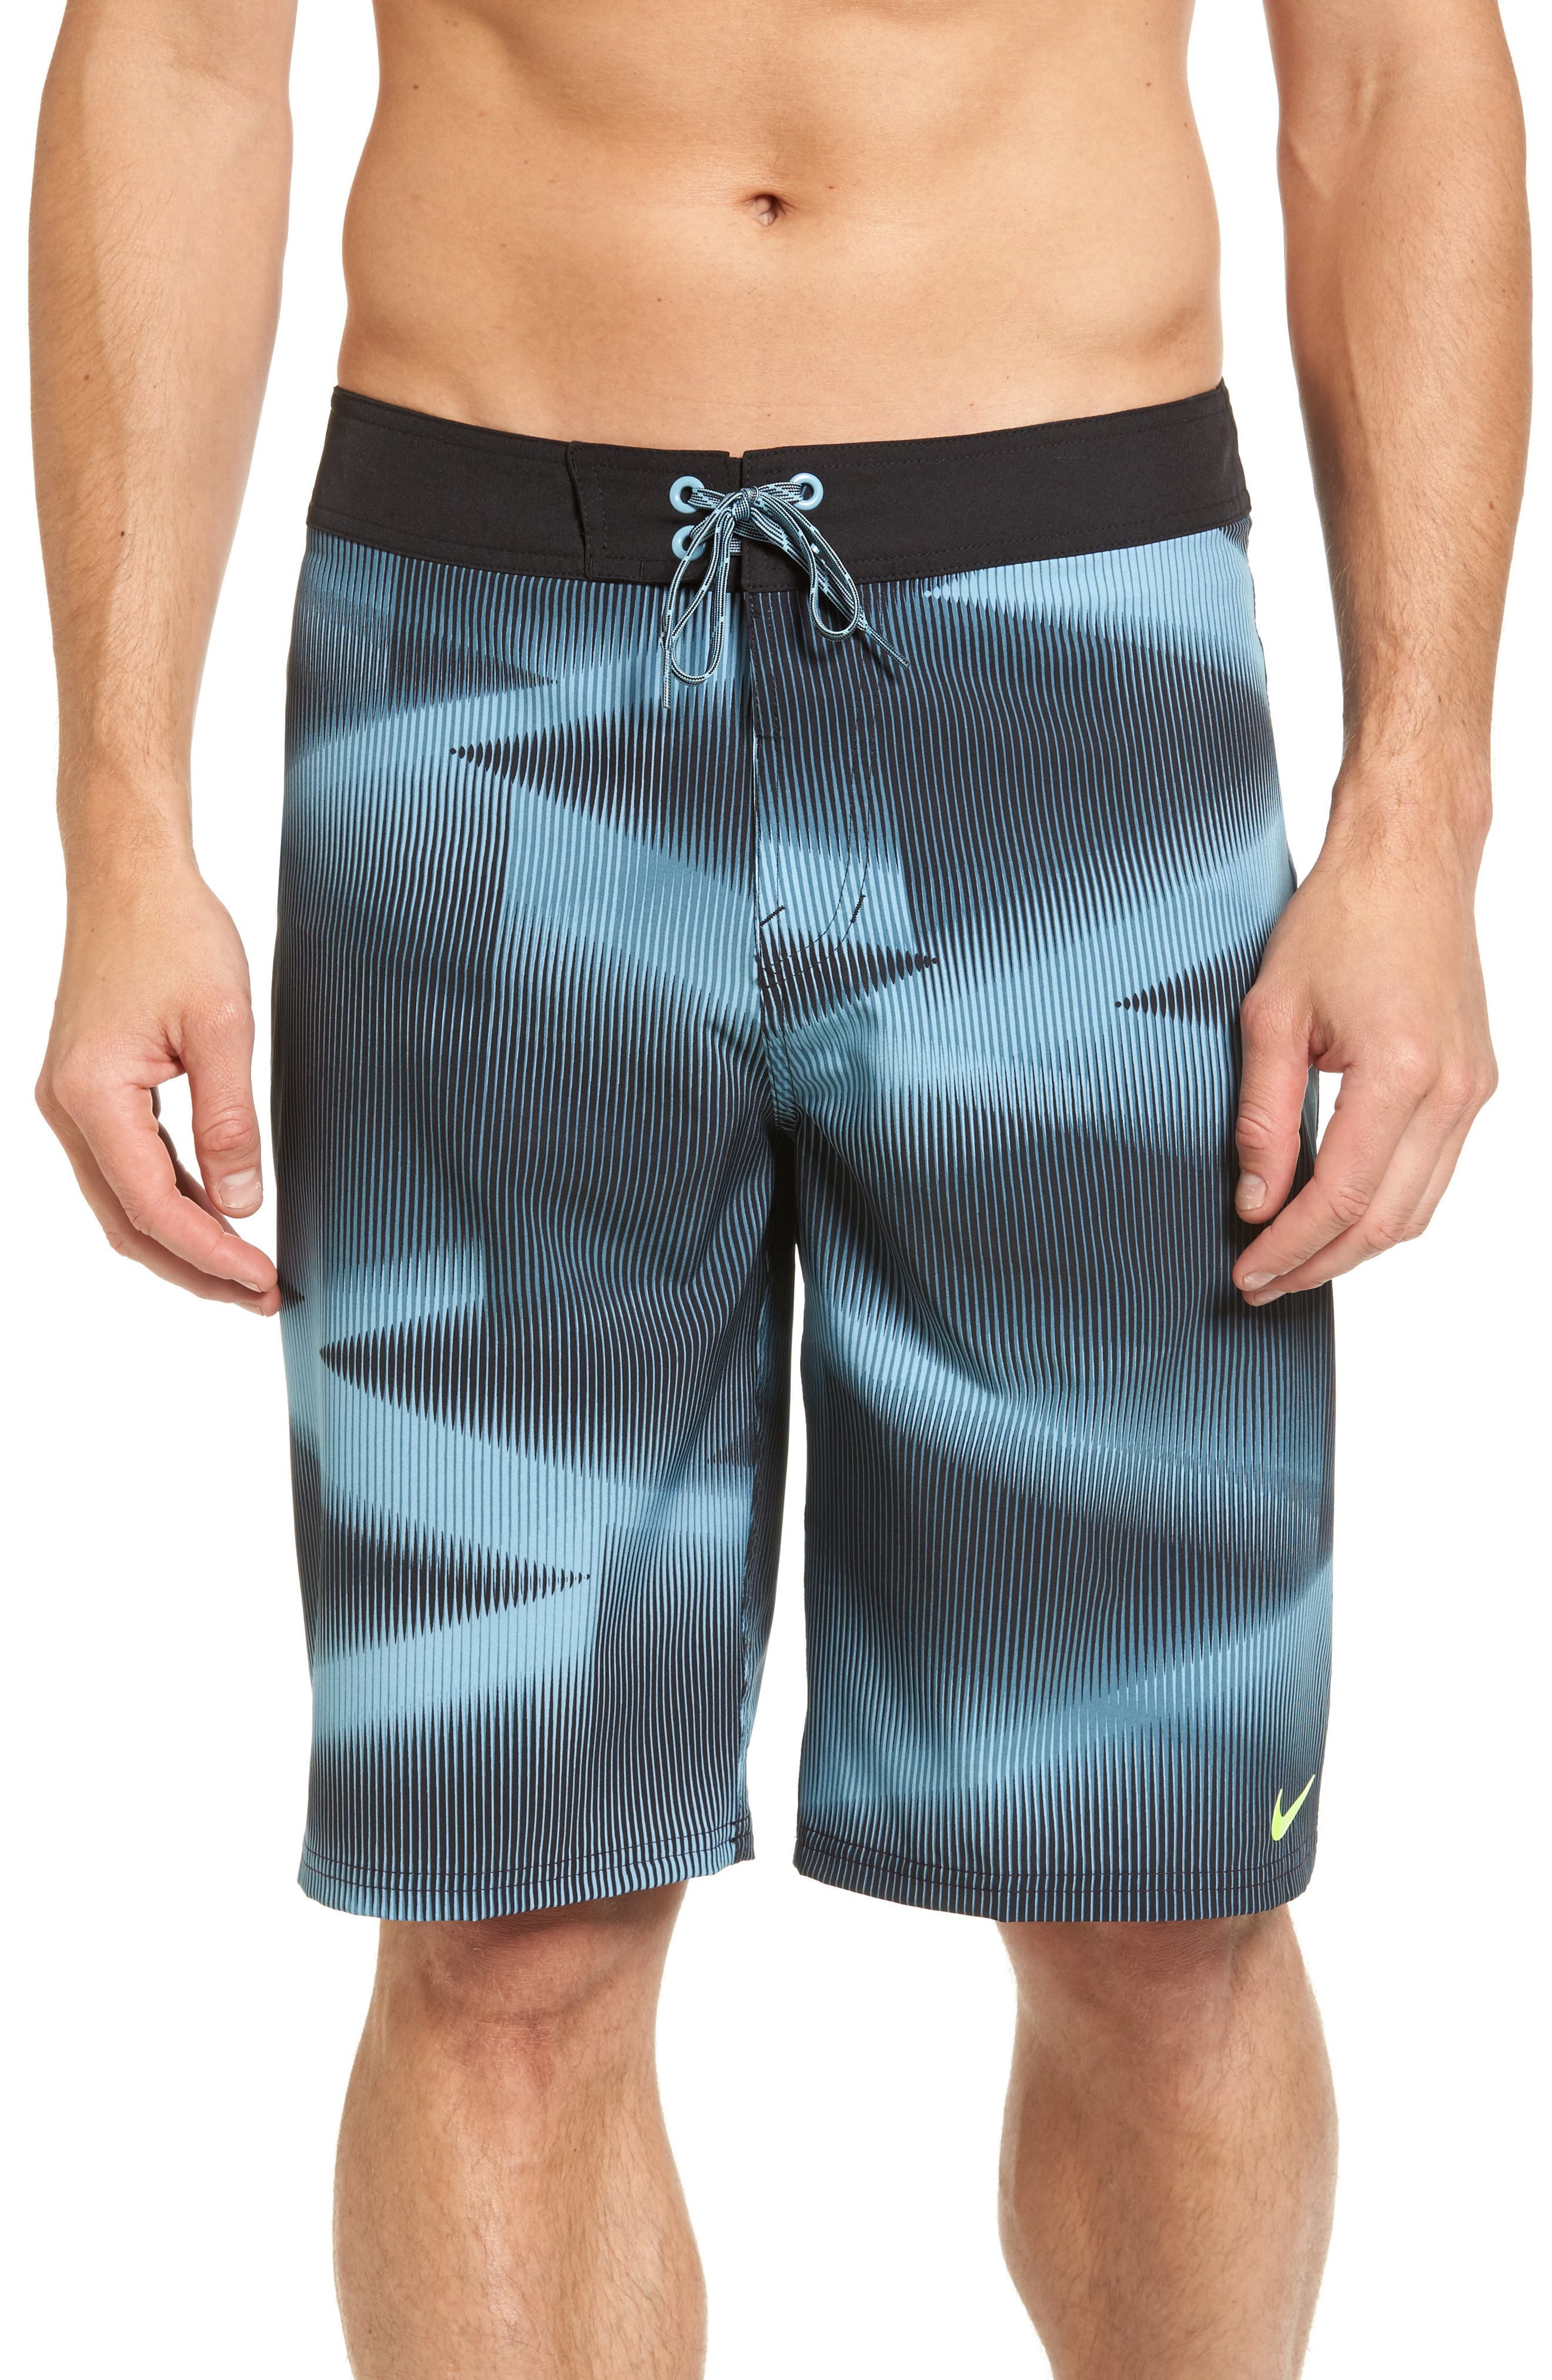 Nike Print Board Shorts